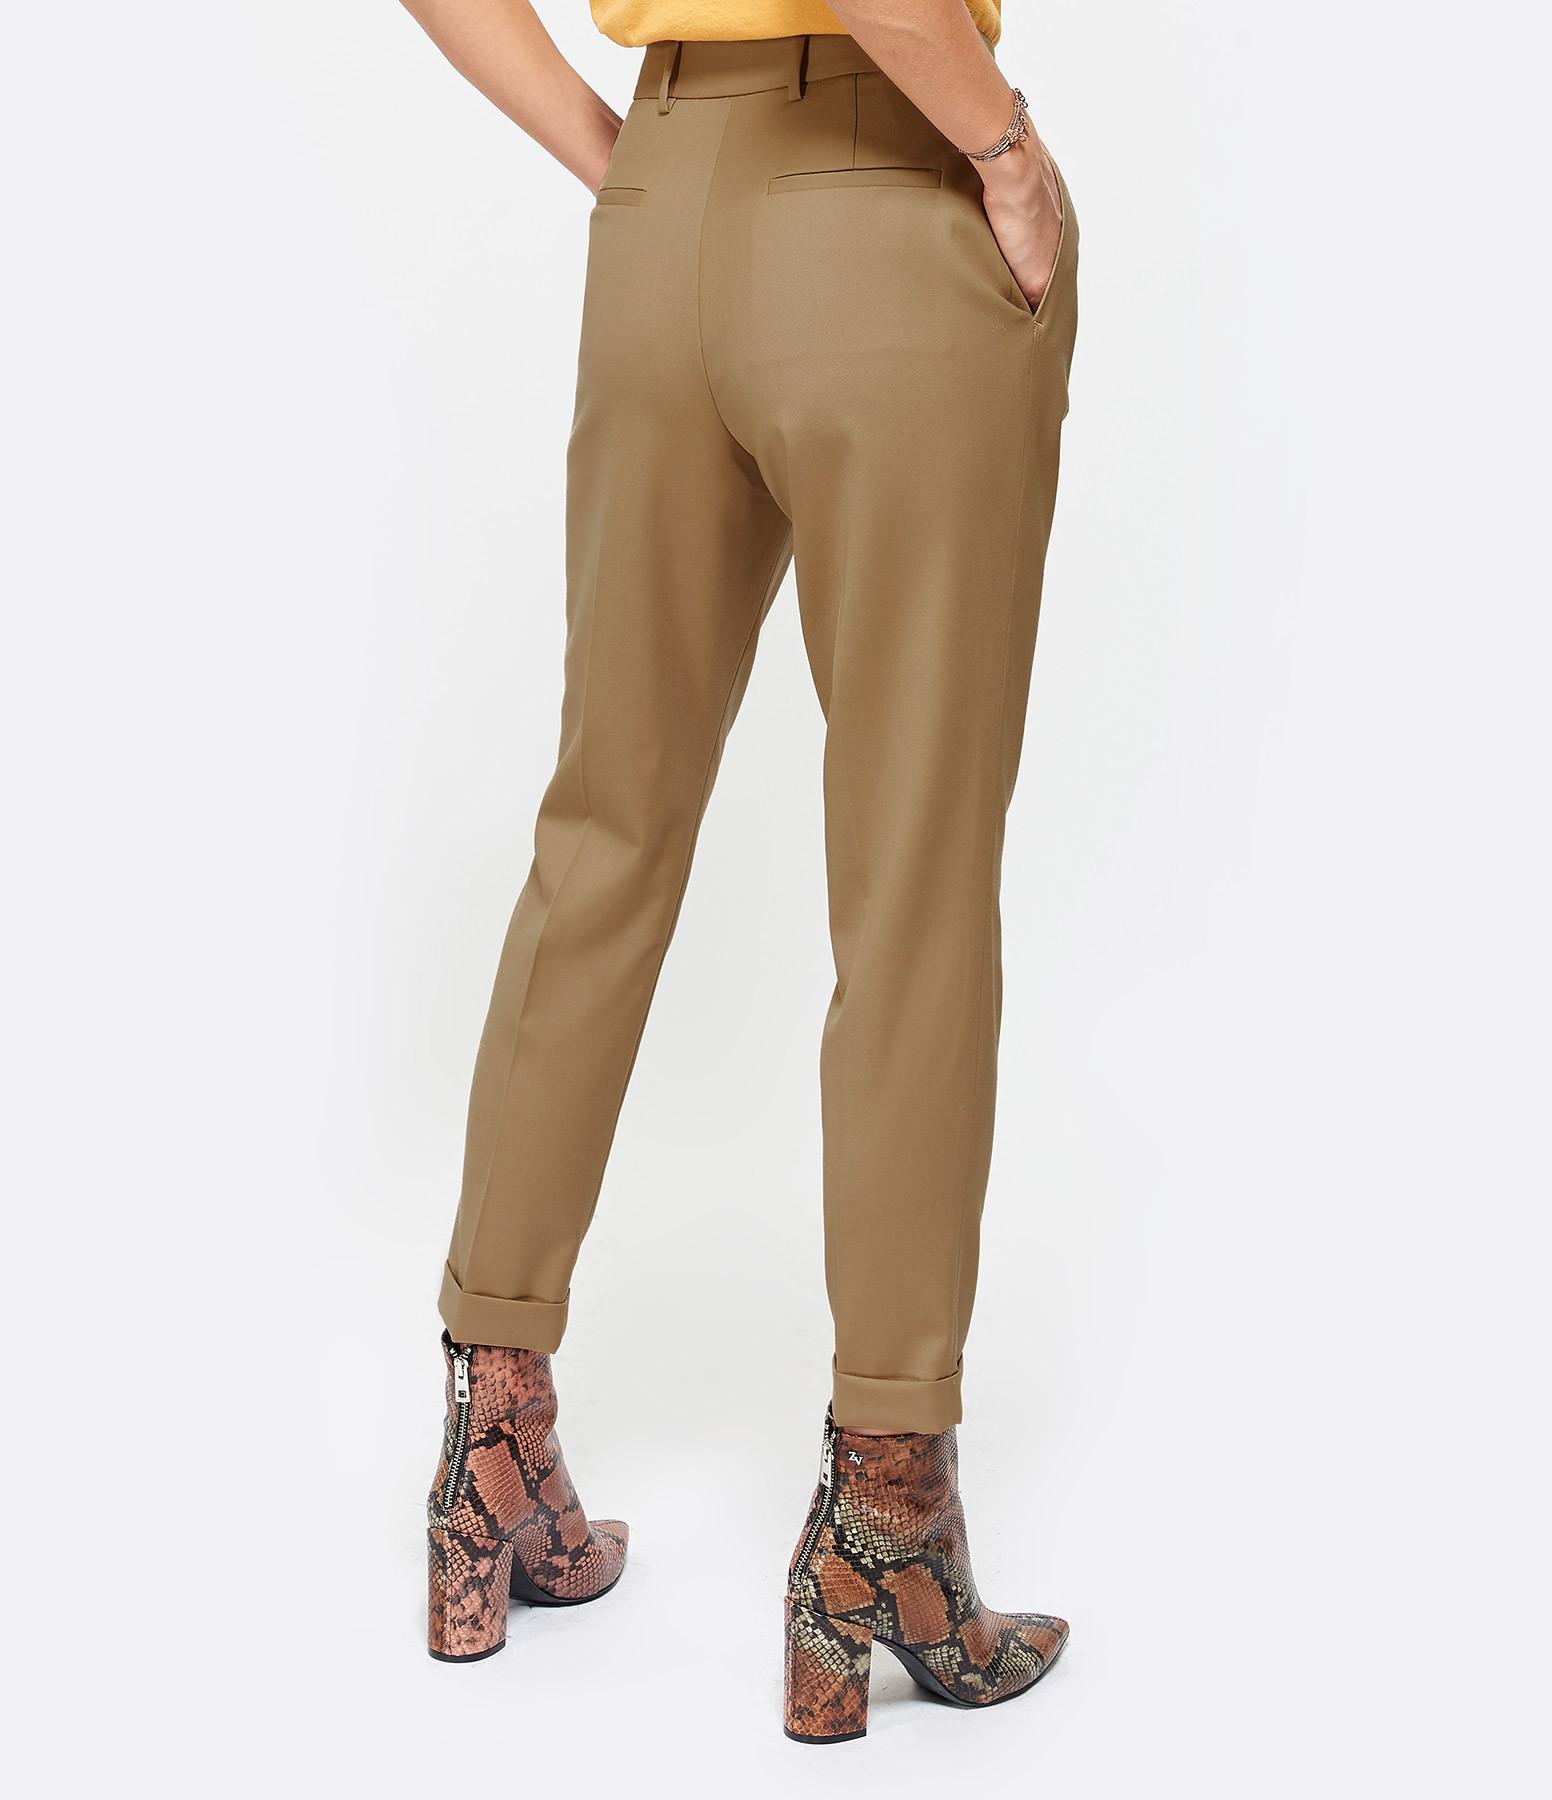 NILI LOTAN - Pantalon Montana Camel